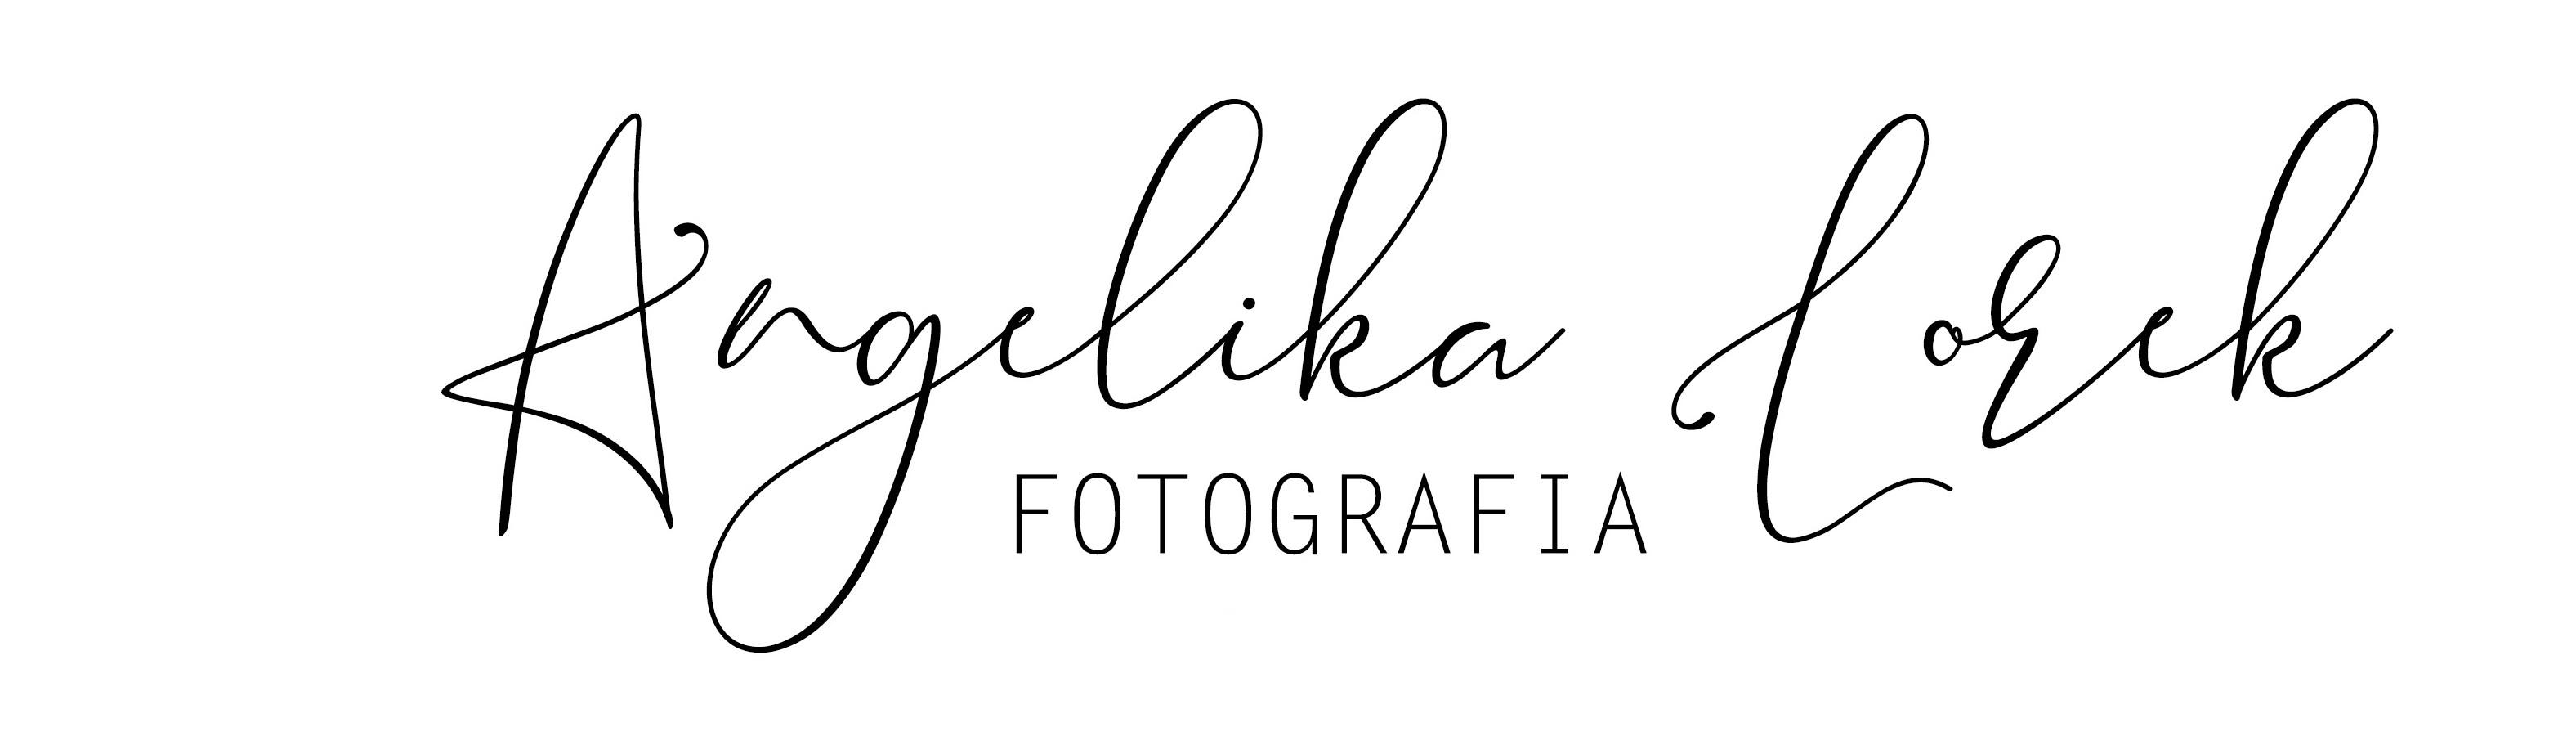 Angelika Lorek Fotografia